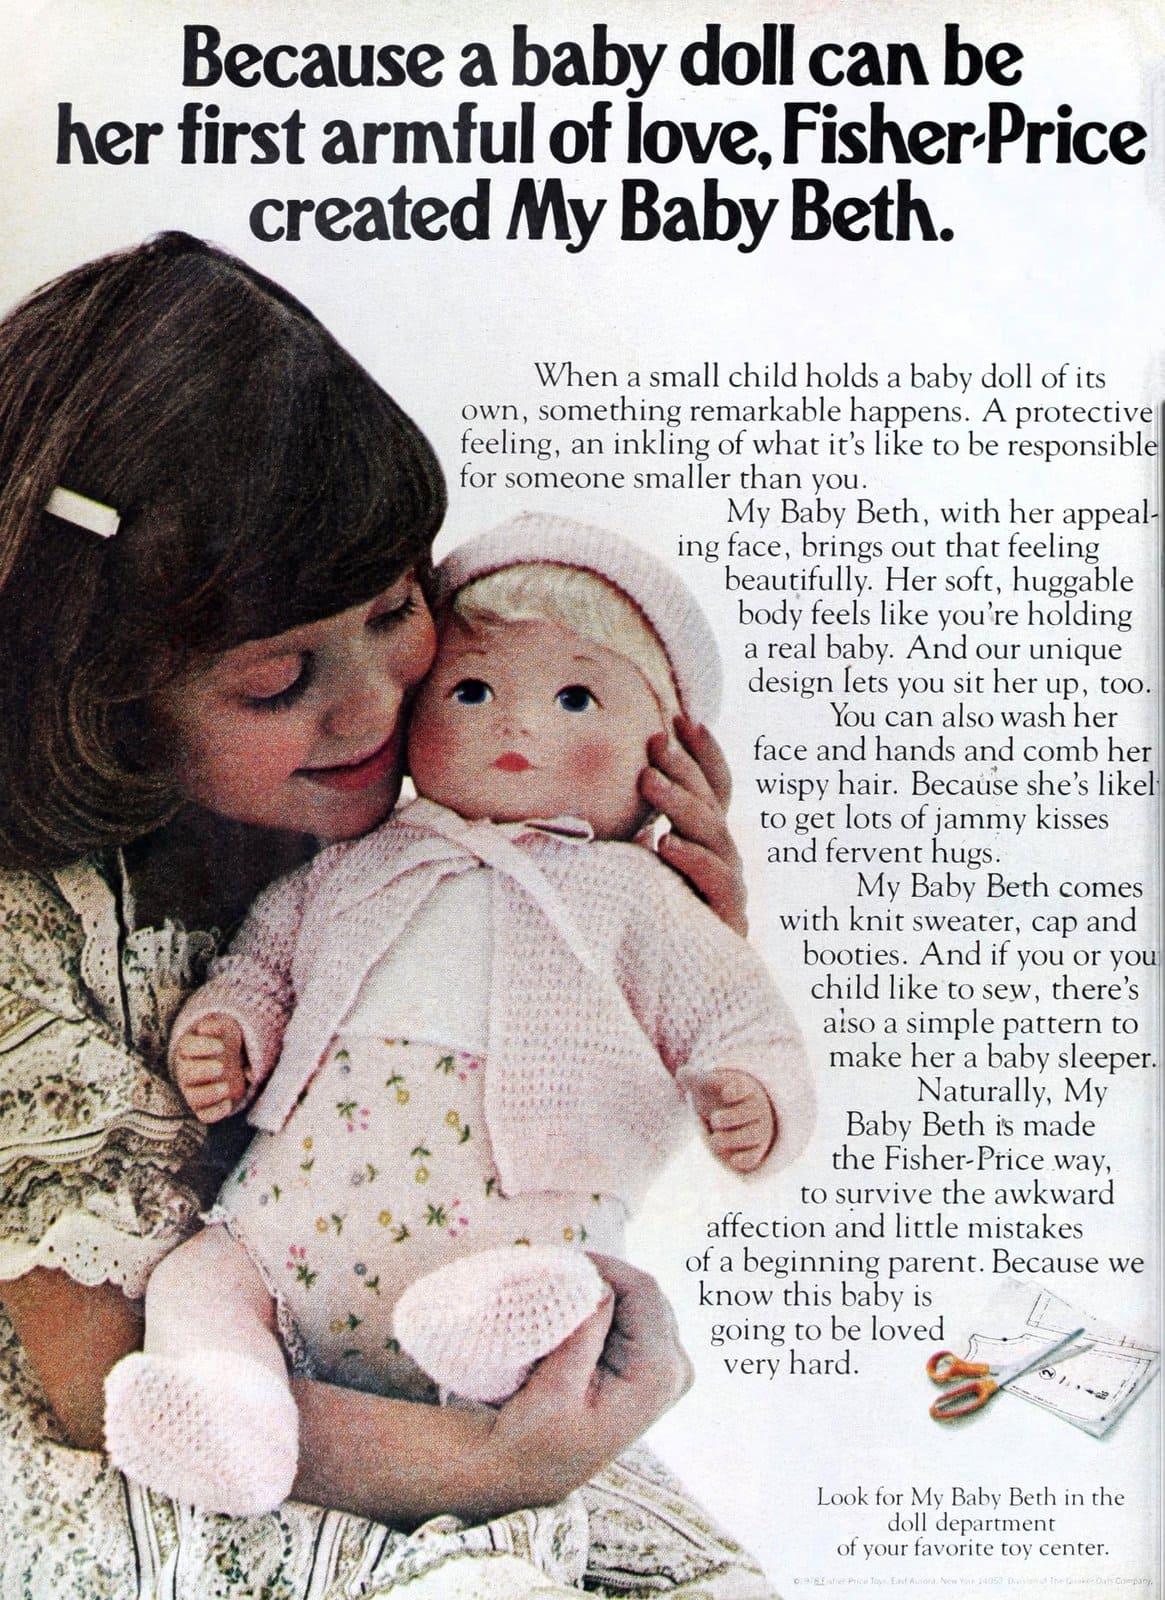 Retro Fisher-Price My Baby Beth doll (1978)